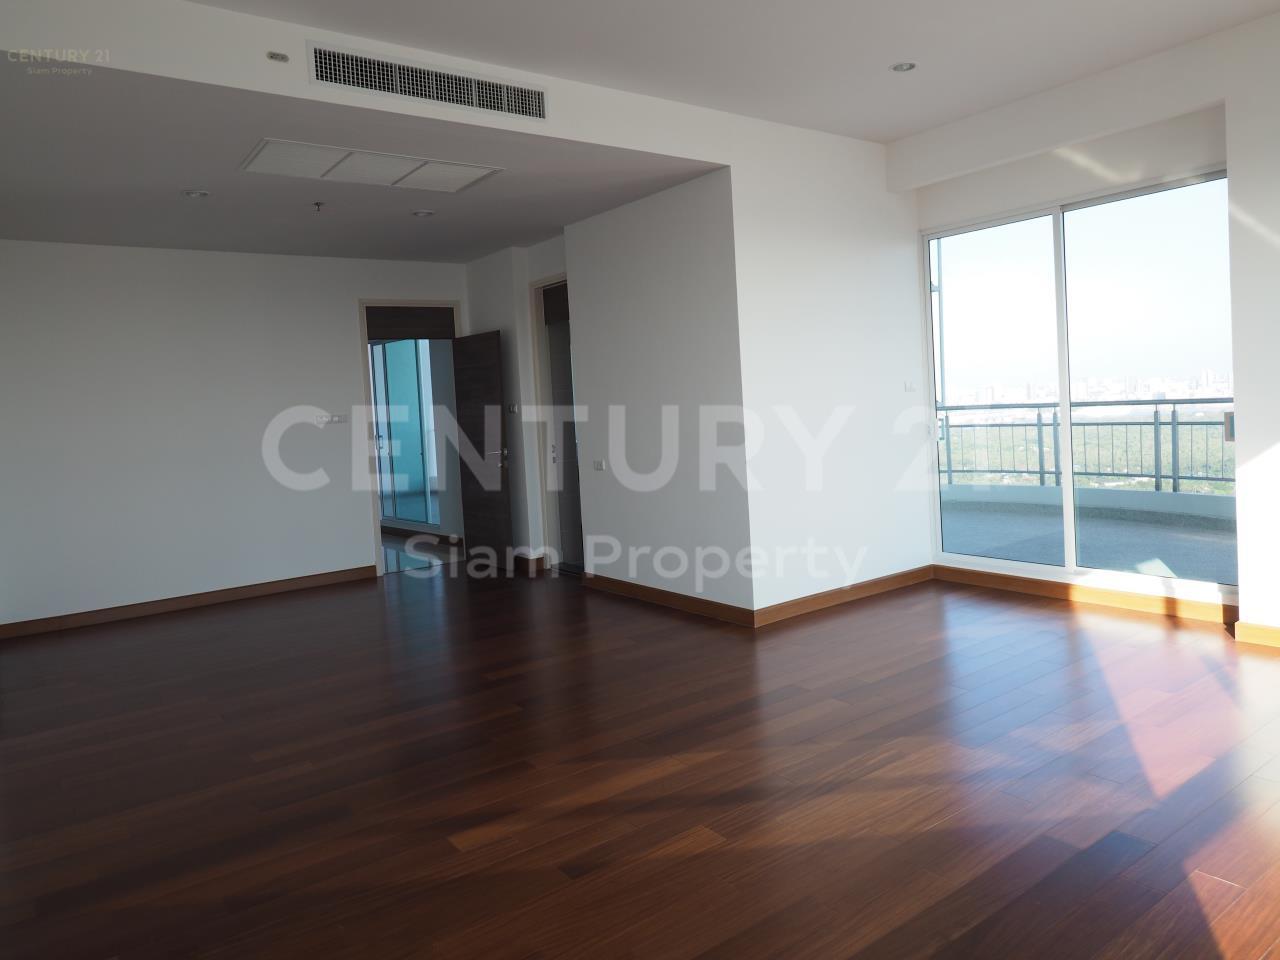 Century21 Siam Property Agency's Supalai Prima Riva 9